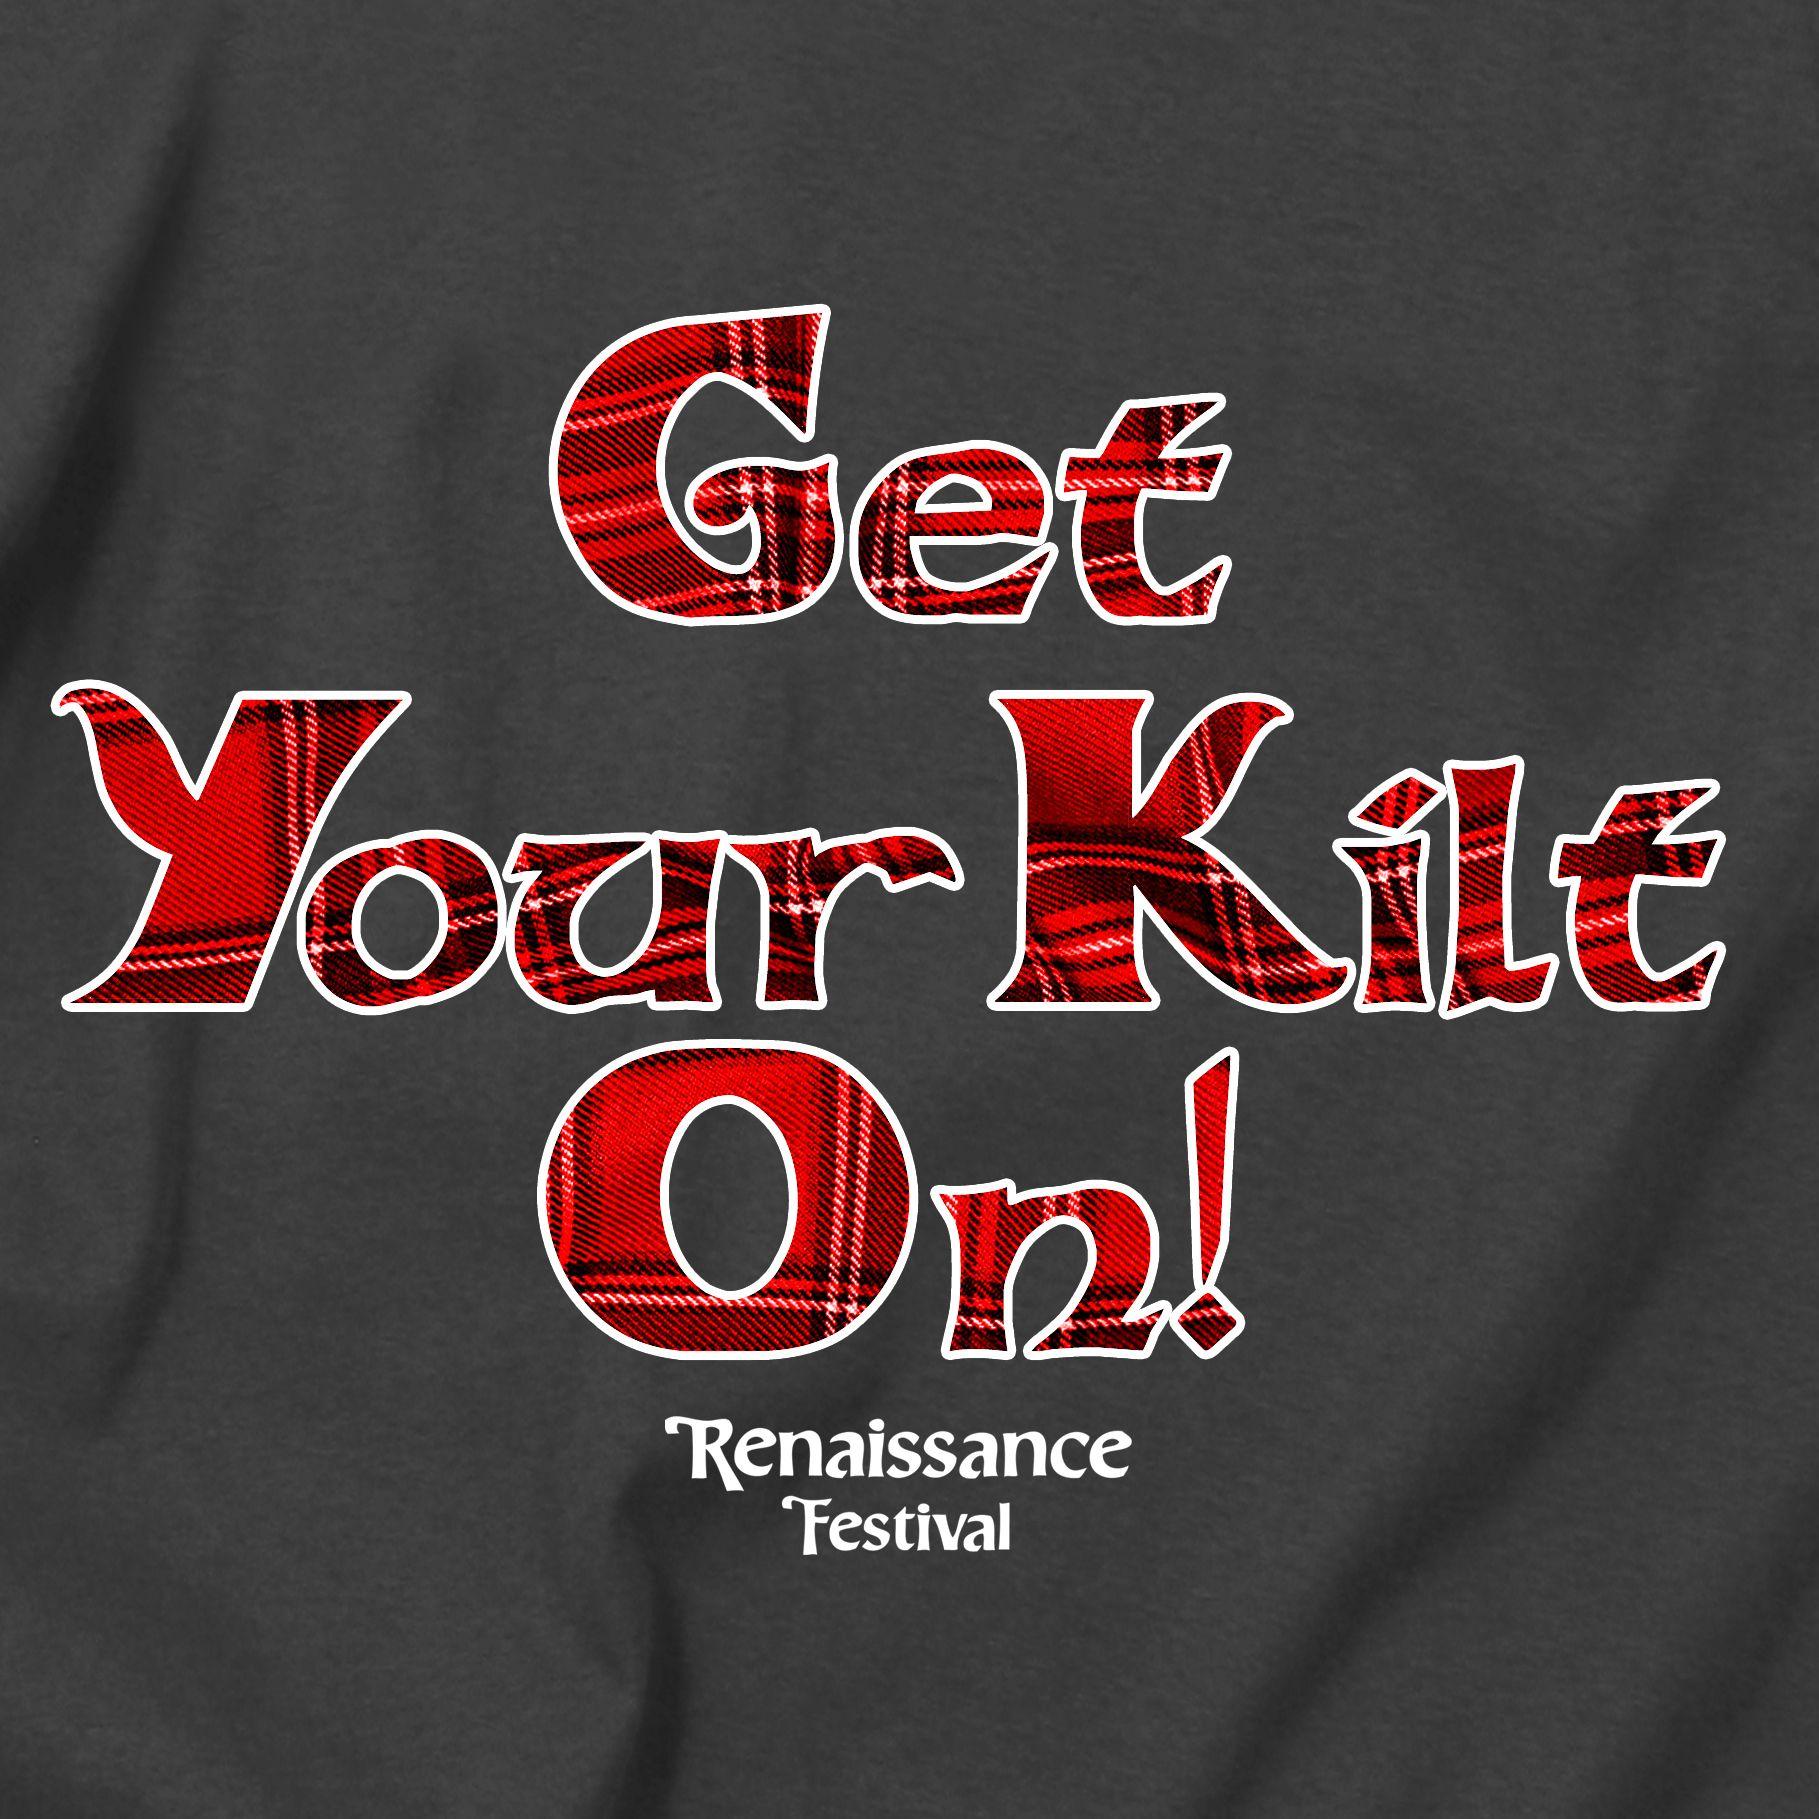 2014 Renaissance Festival Mn Ks Fl Mi Tee Shirt Design And Slogan